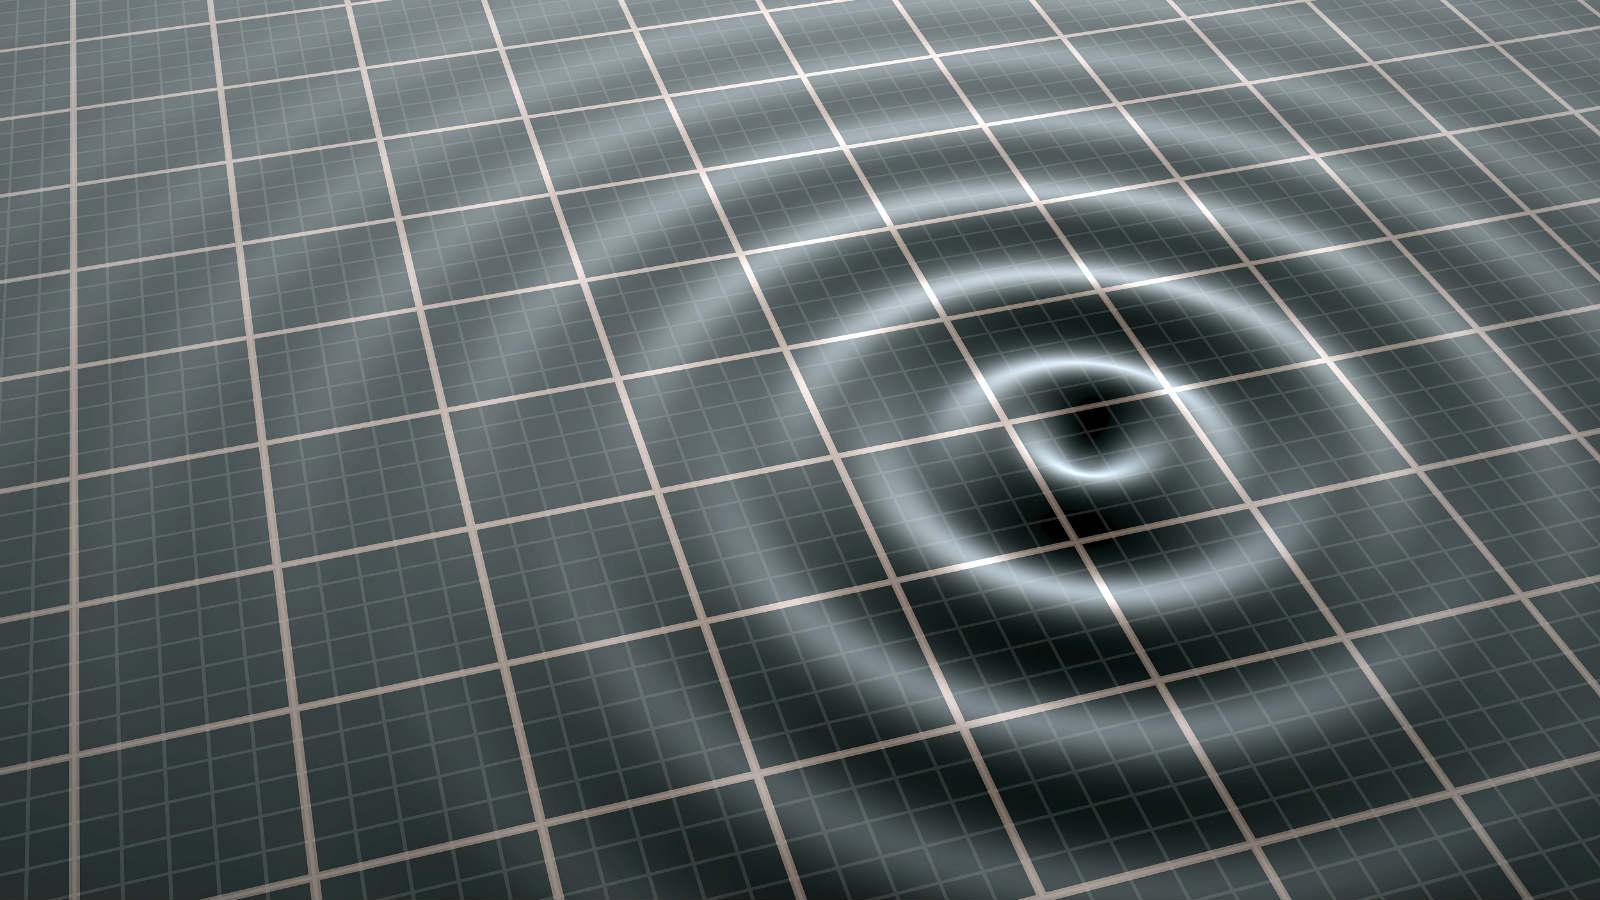 6.0-magnitude quake hits 289 km WNW of Haveluloto, Tonga -- USGS